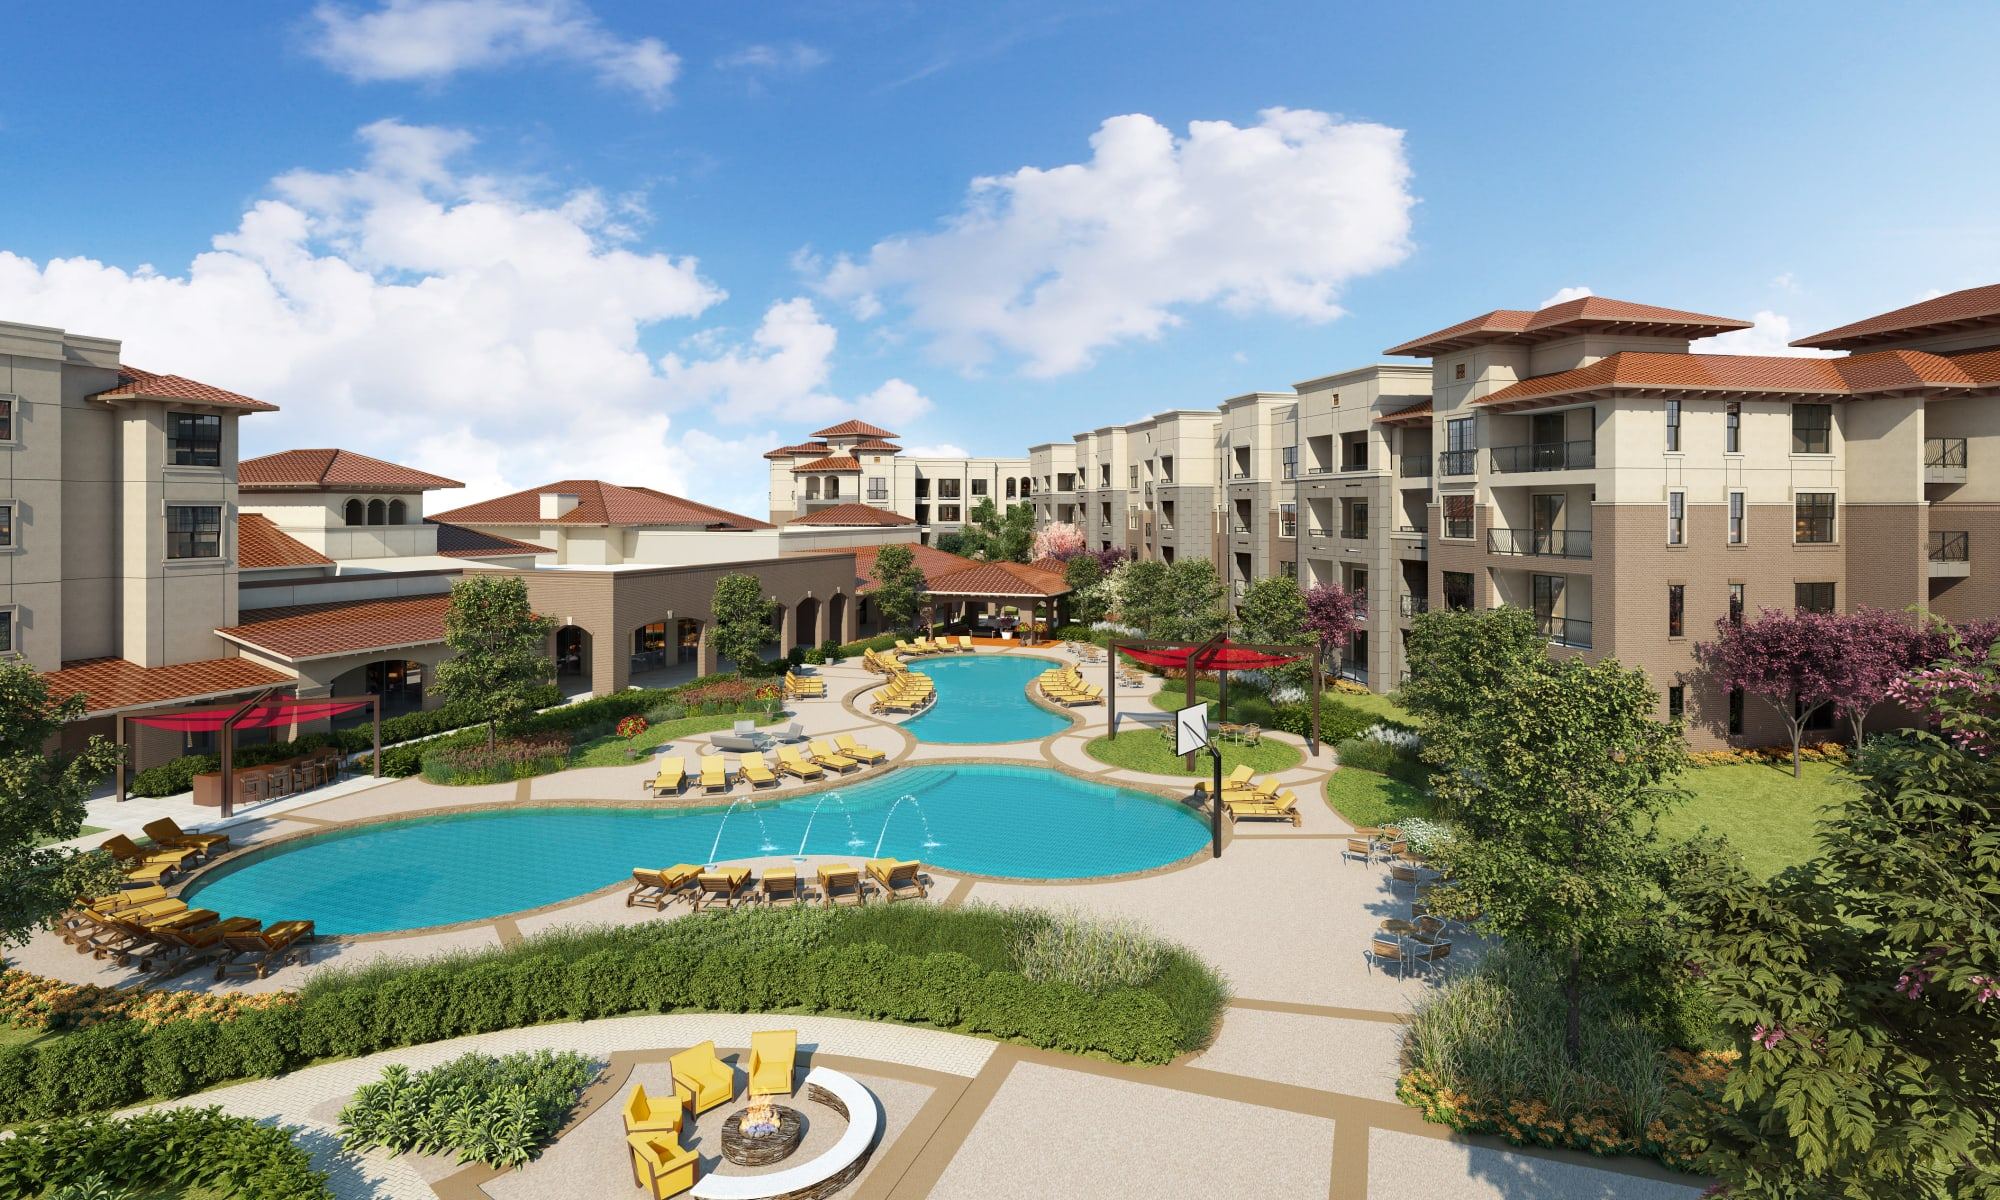 Apartments at Villas at the Rim in San Antonio, Texas